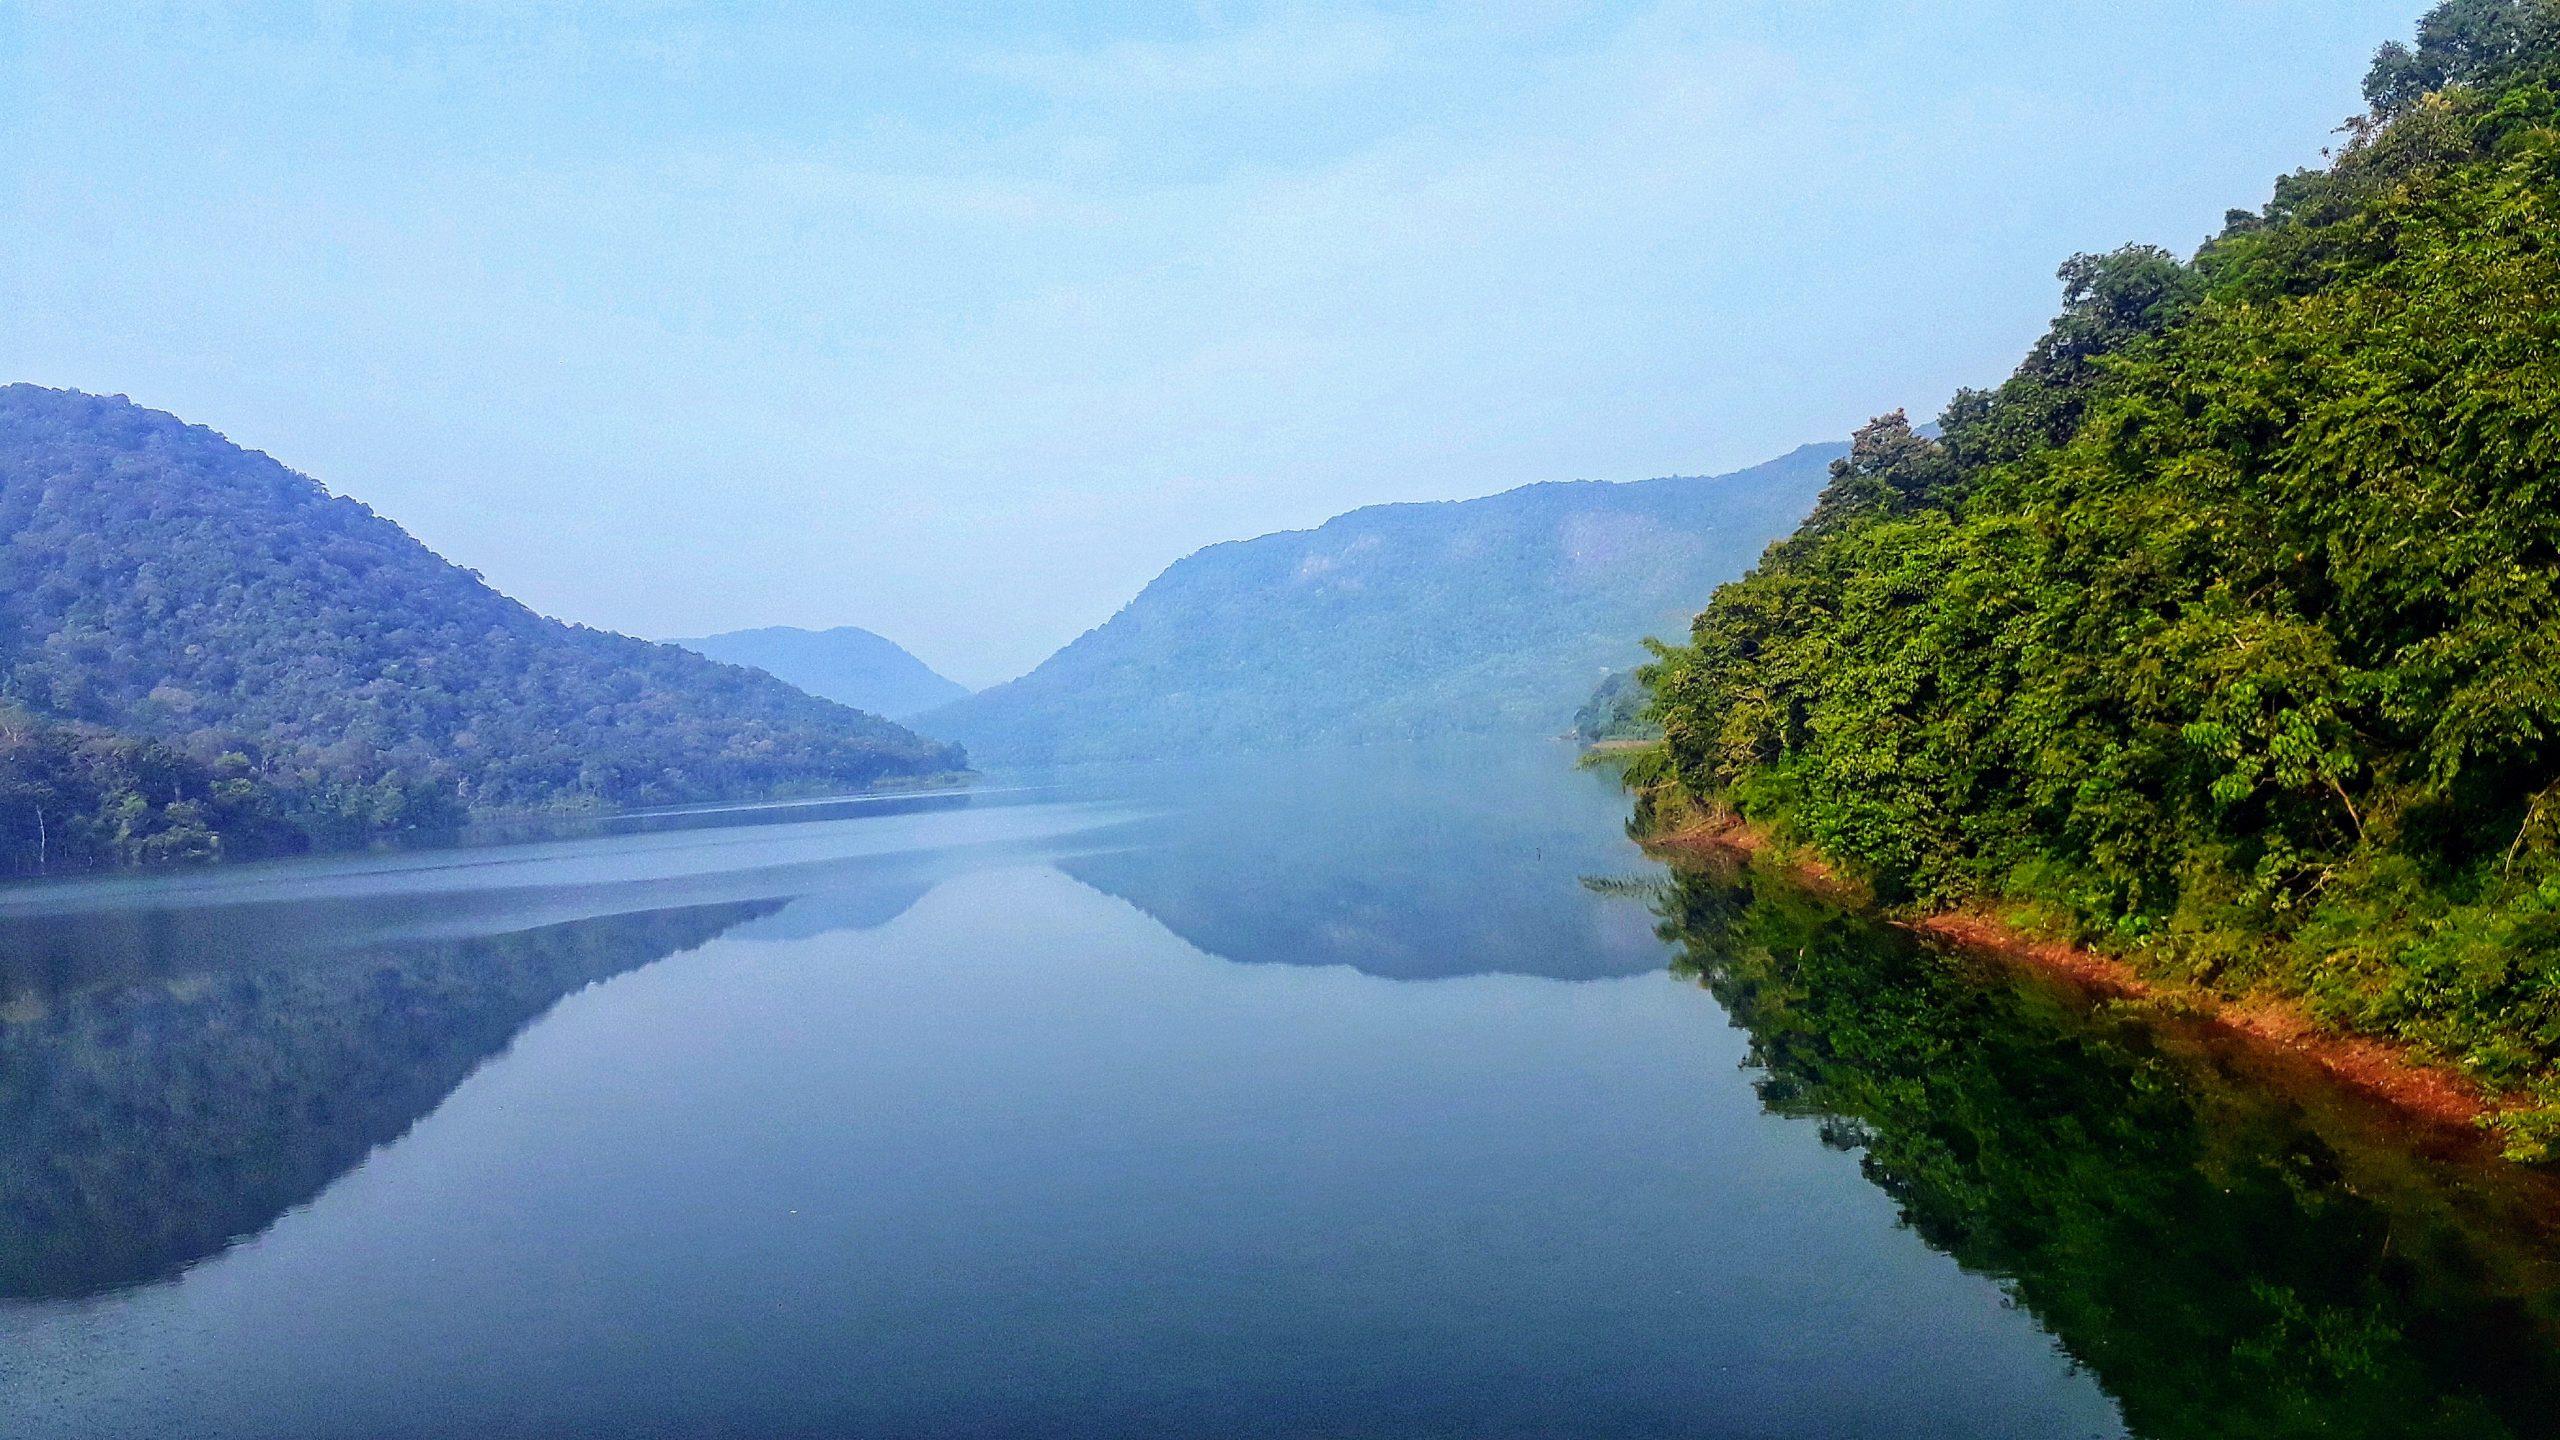 A lake amidst hills.